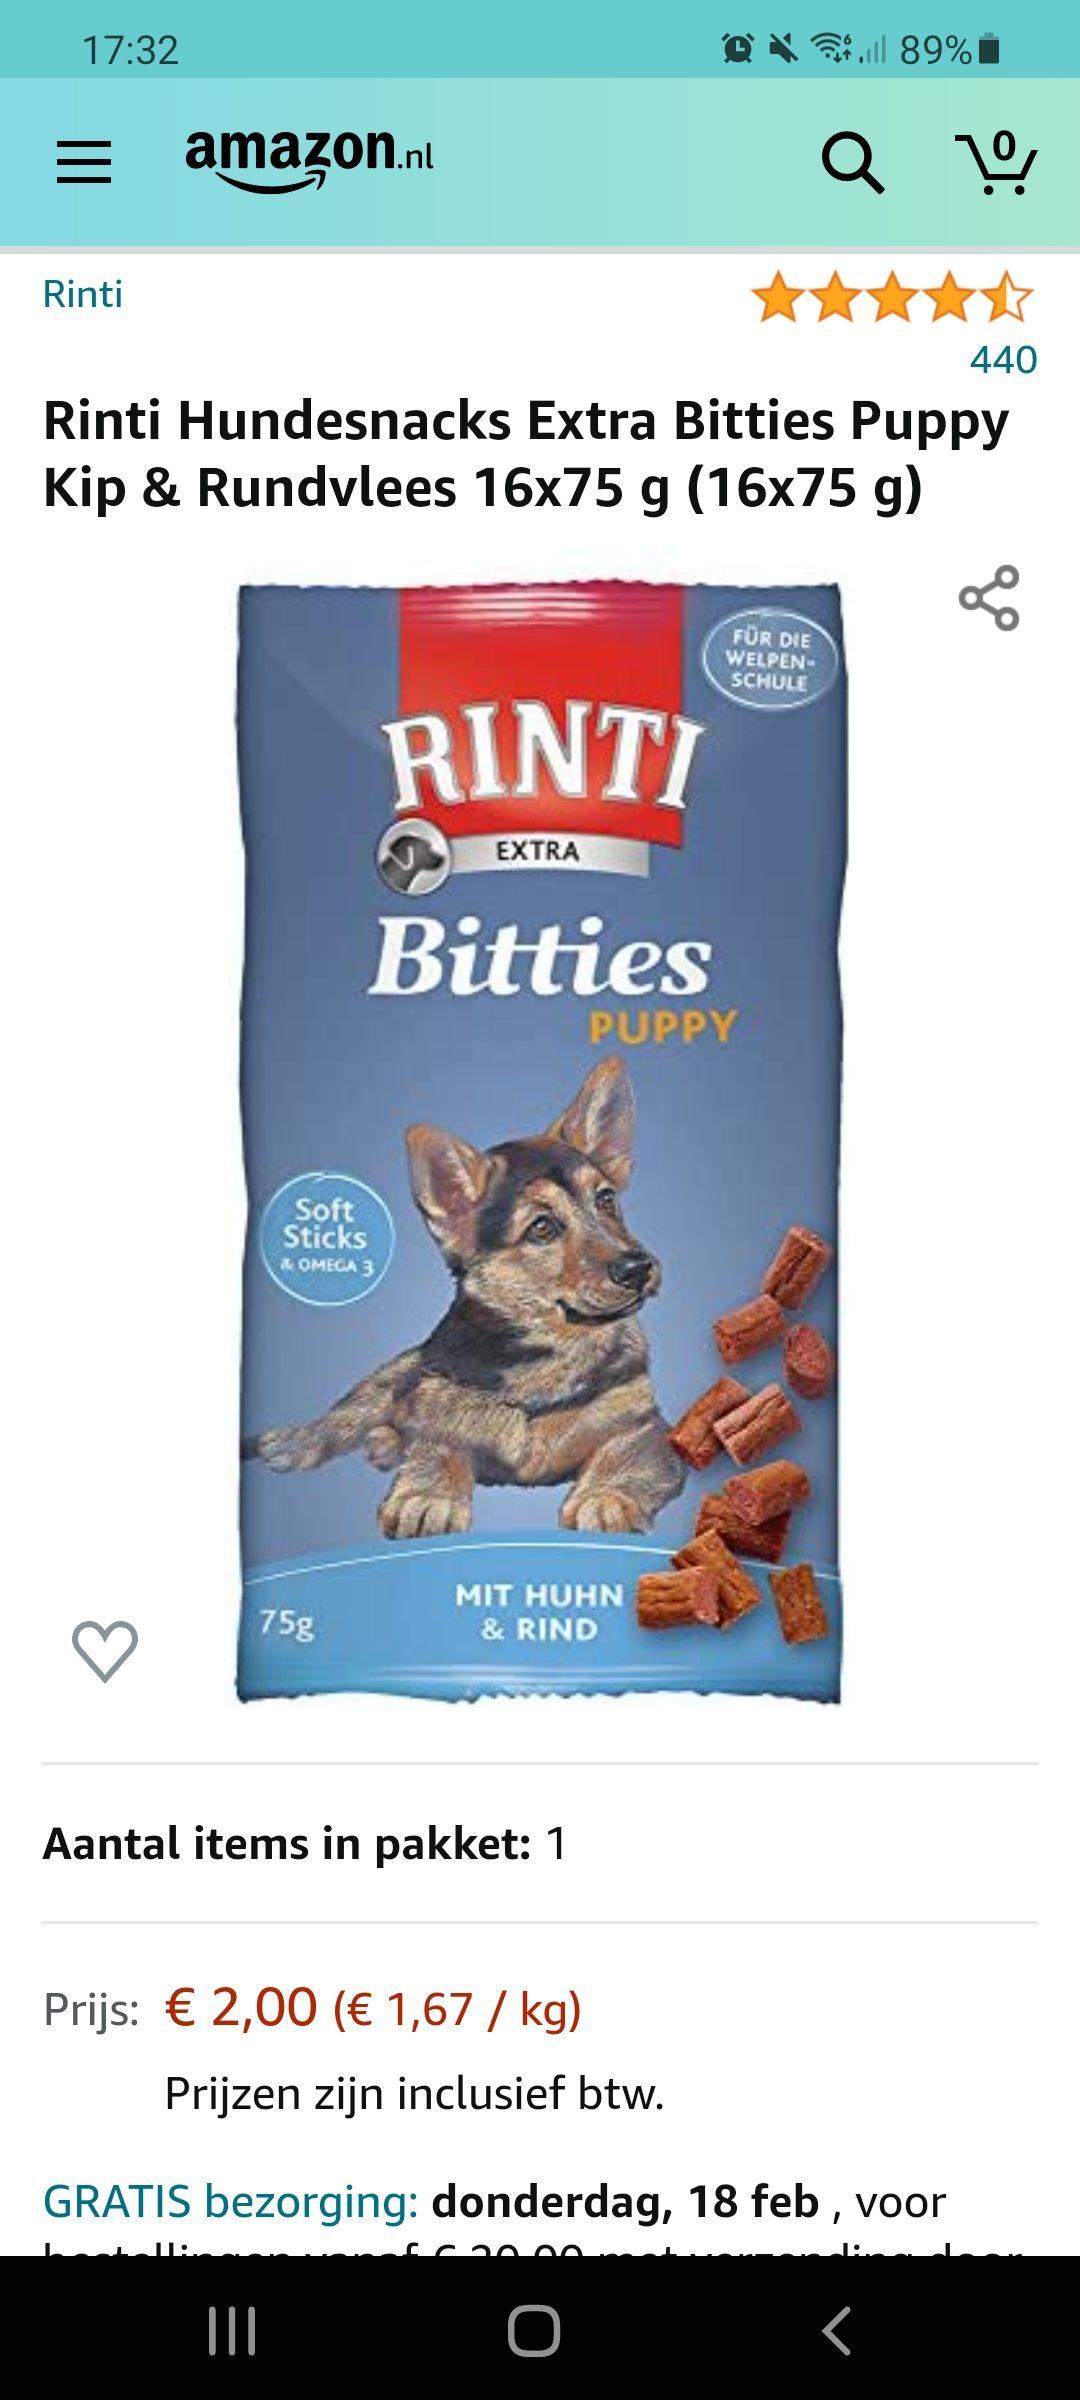 Rinti Hundesnacks Extra Bitties Puppy Kip & Rundvlees 16x75 g (16x75 g)